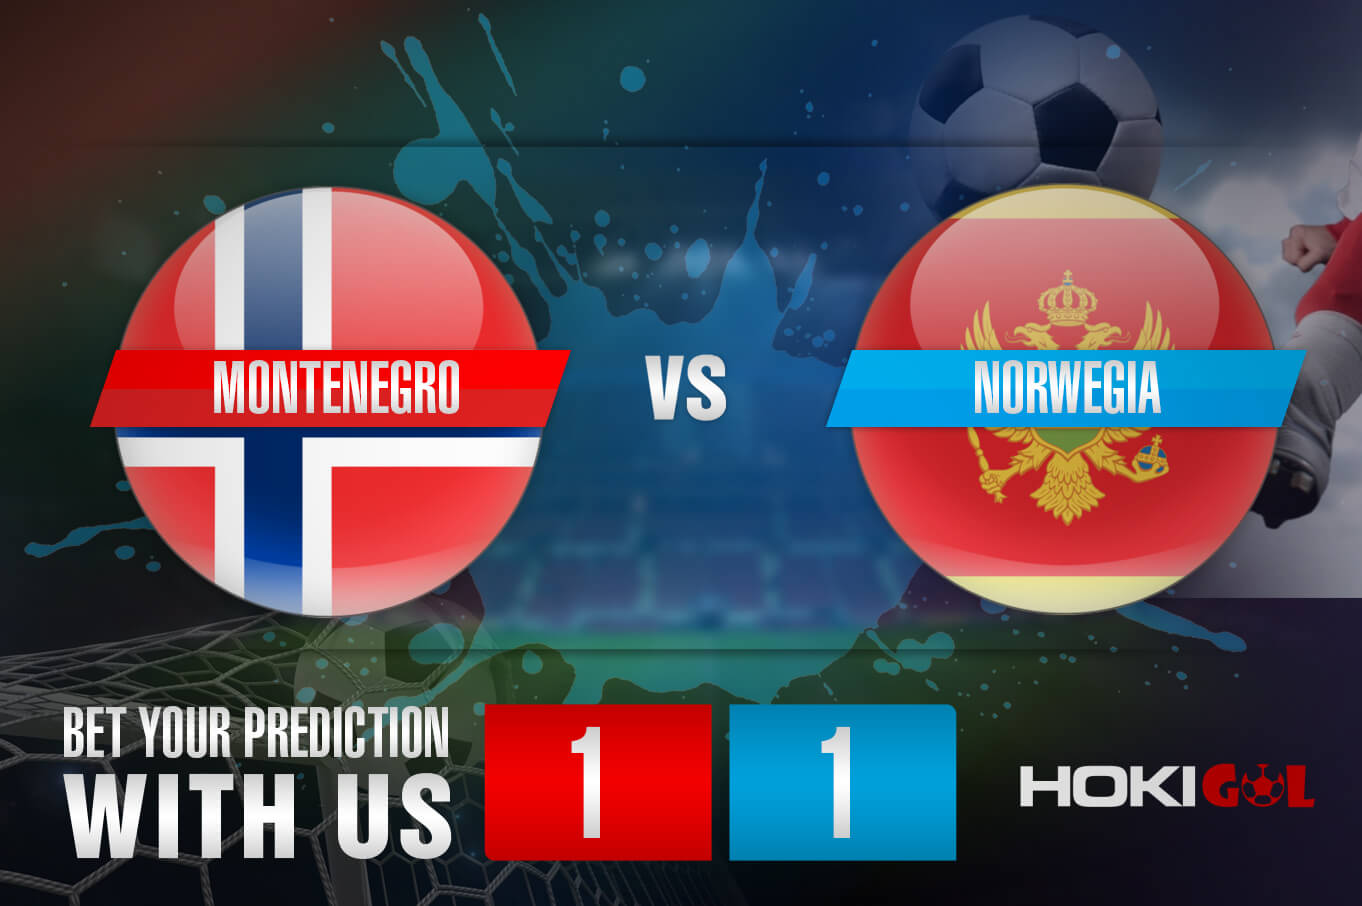 Prediksi Bola Montenegro Vs Norwegia 31 Maret 2021